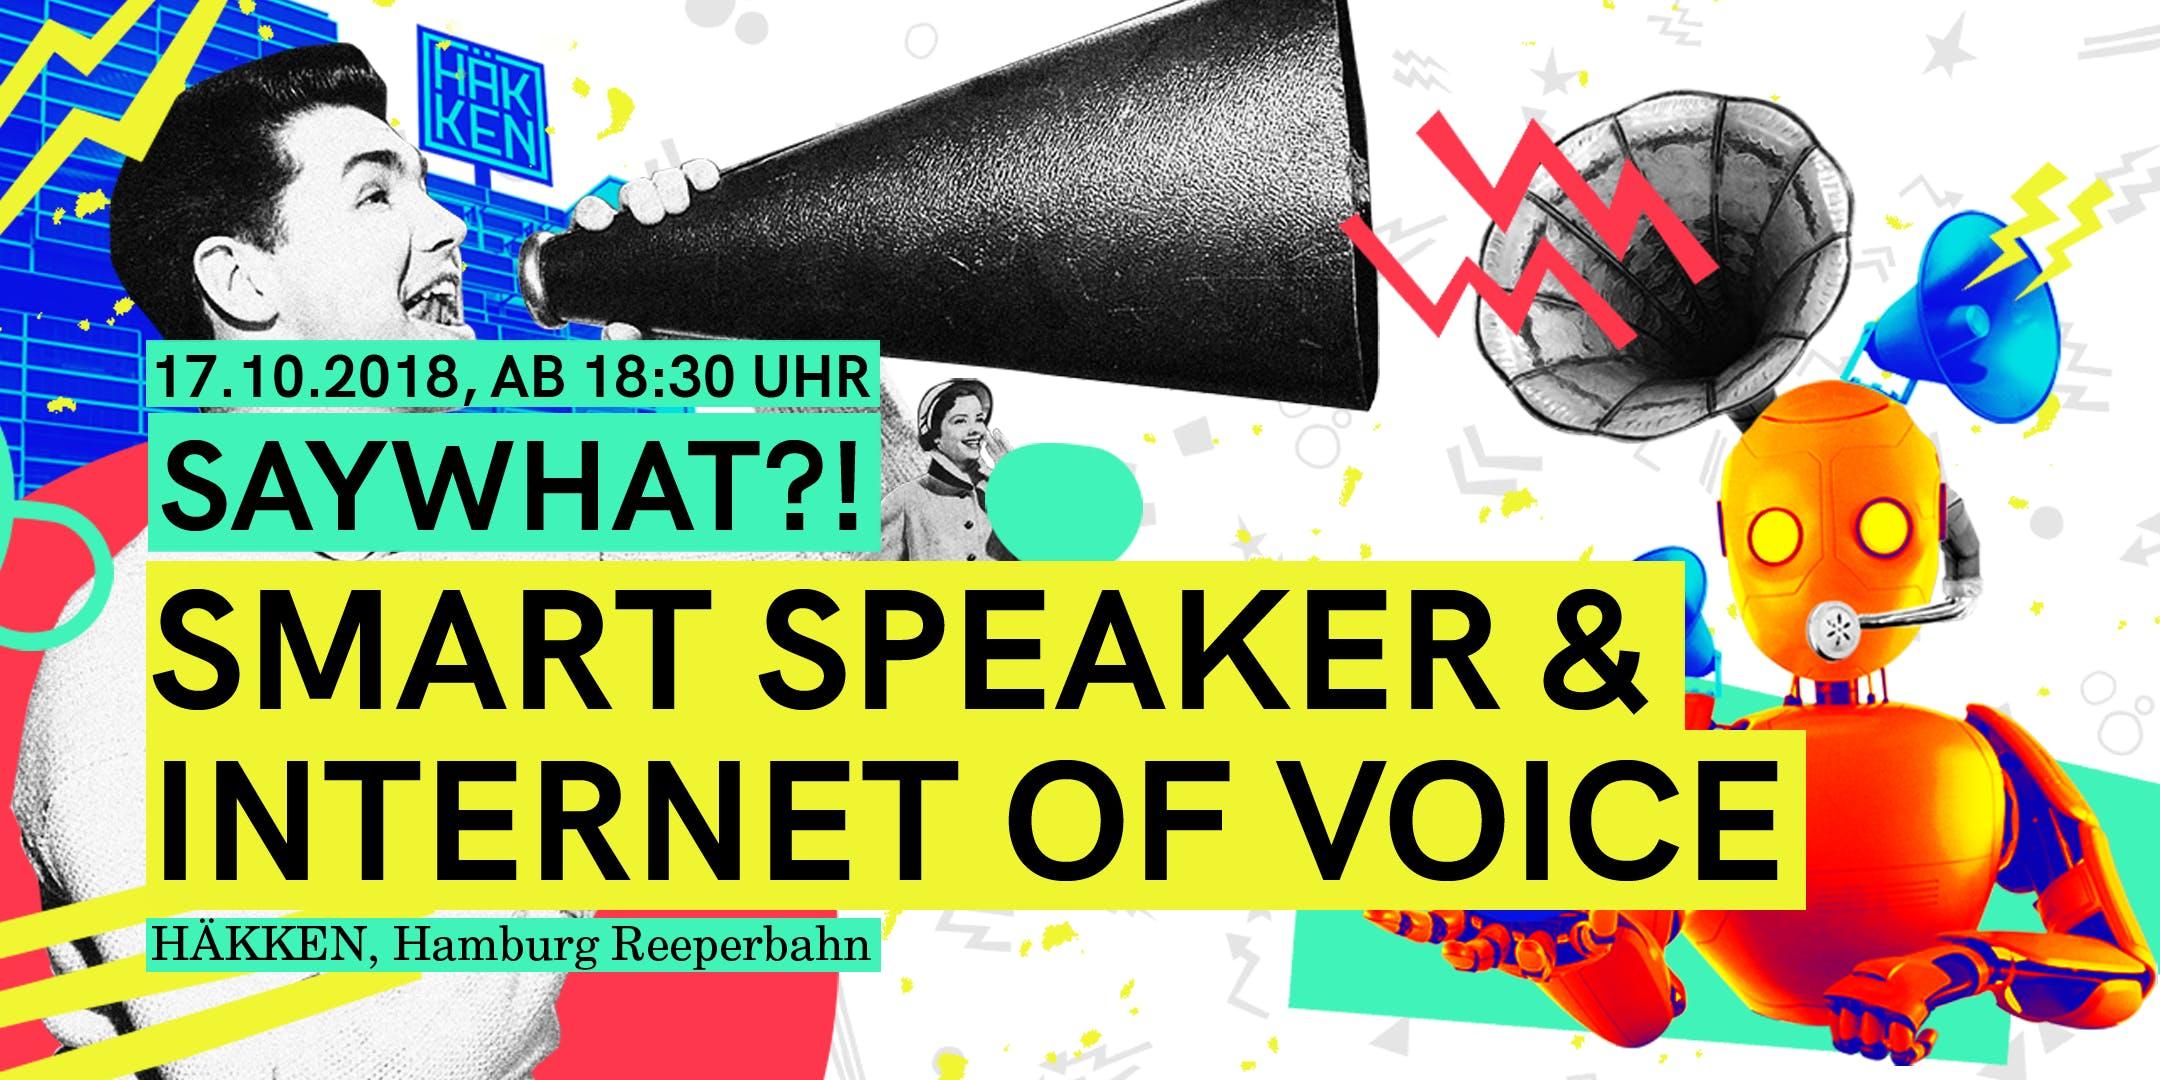 SAYWHAT?! #2 Smartspeaker & Internet of Voice